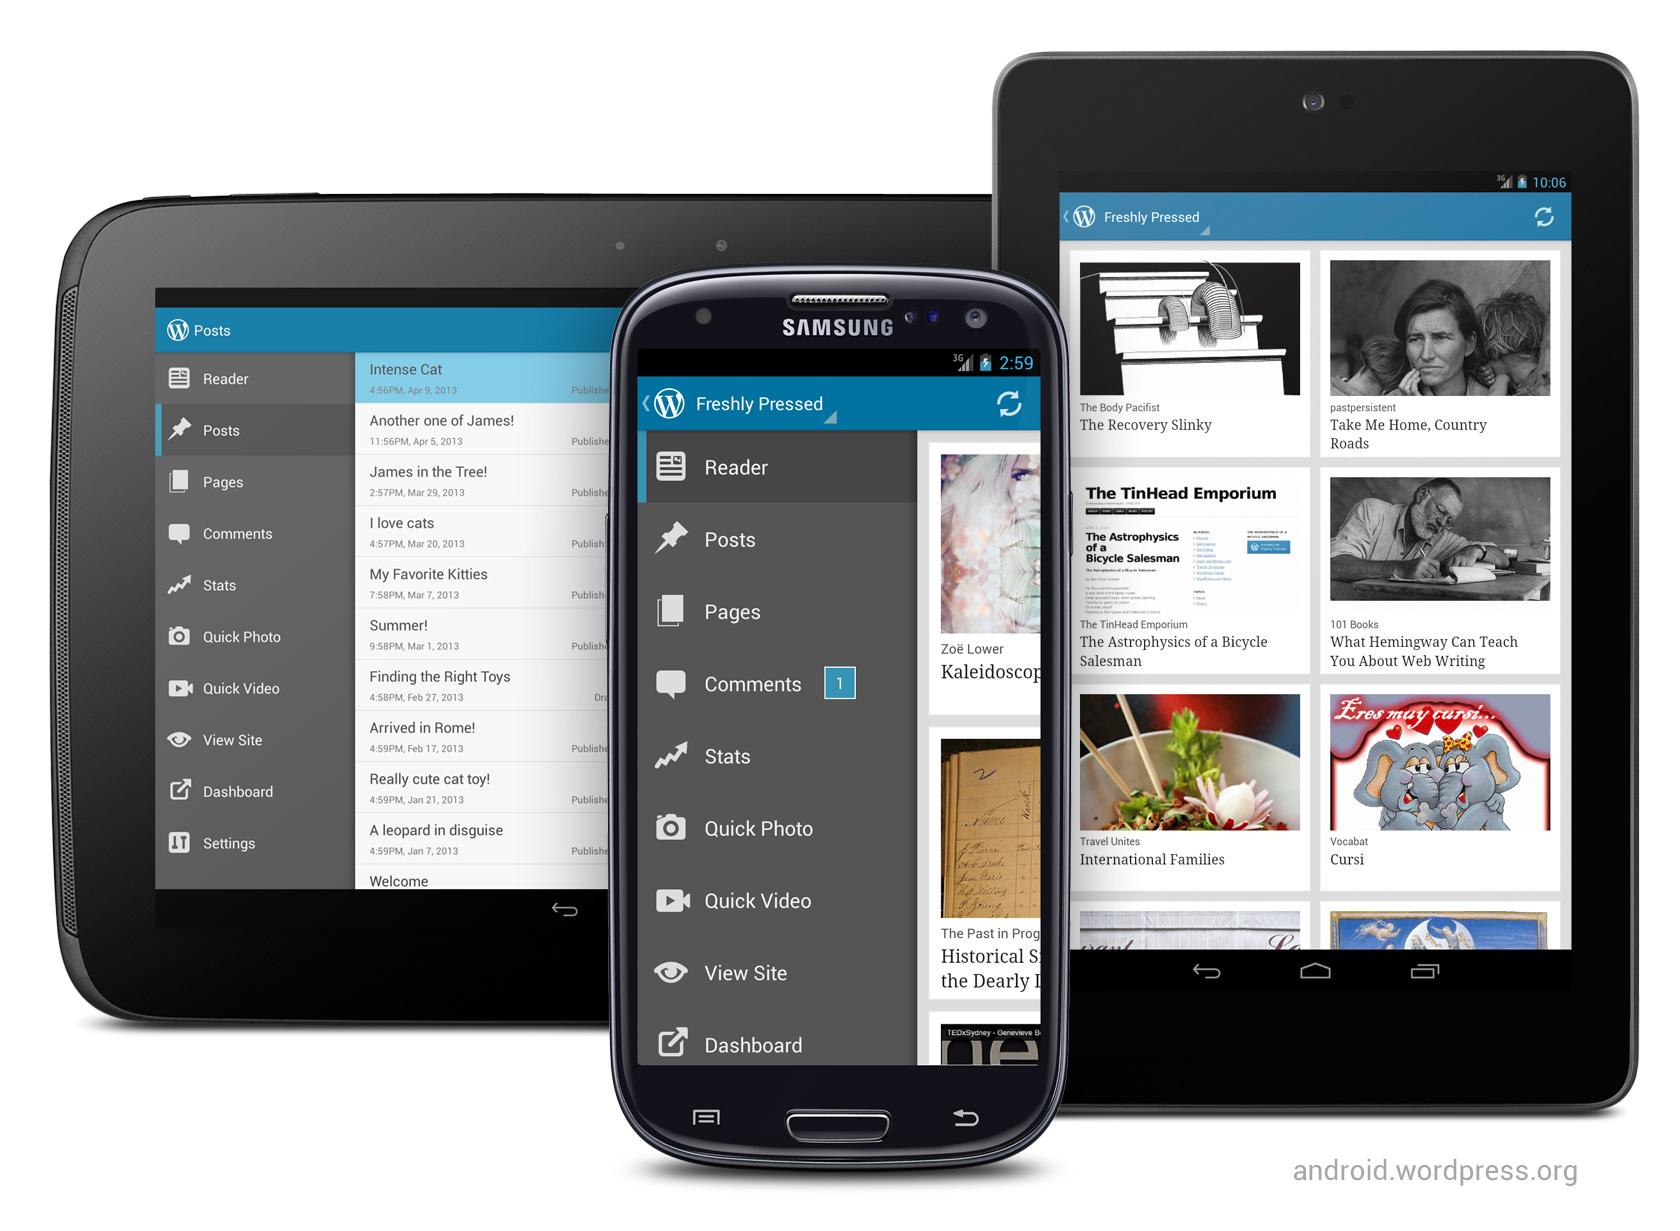 wordpress-com-news-wordpress-for-android-ui-update2